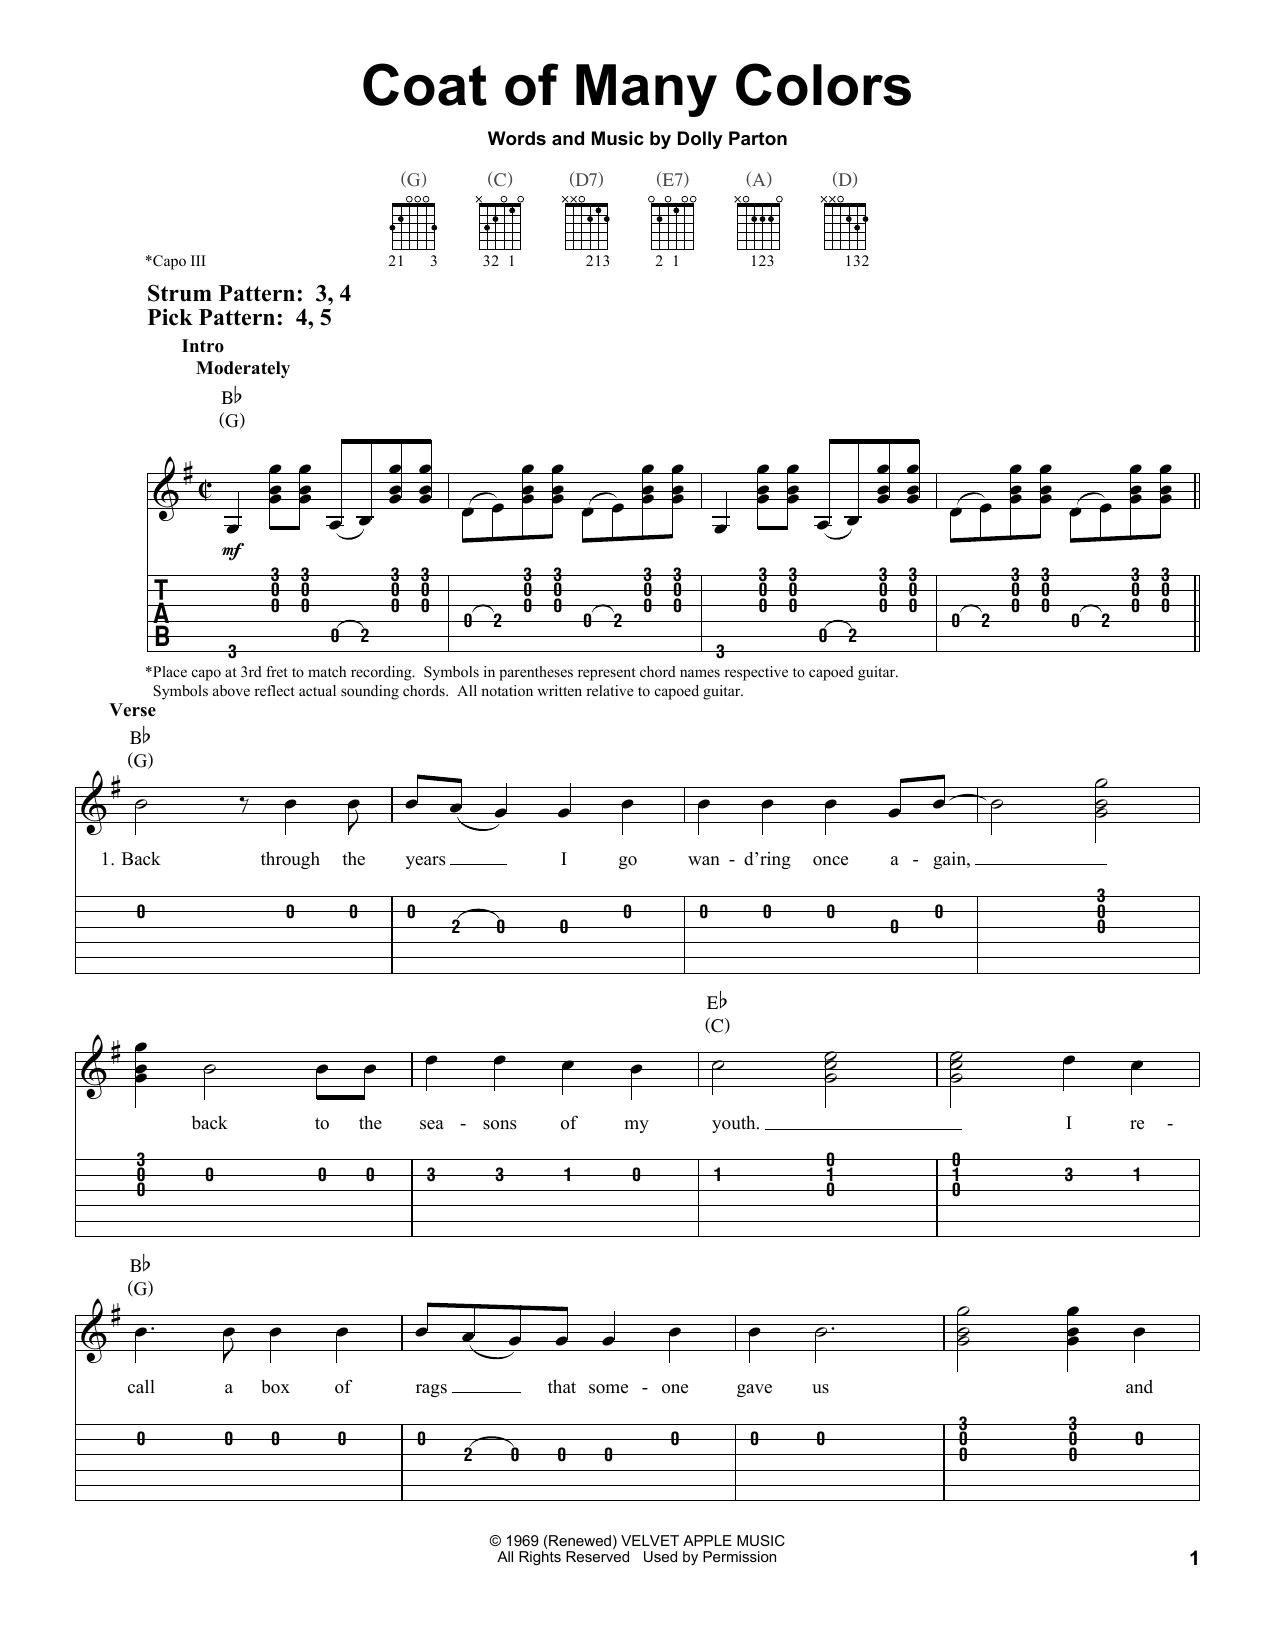 Coat Of Many Colors sheet music